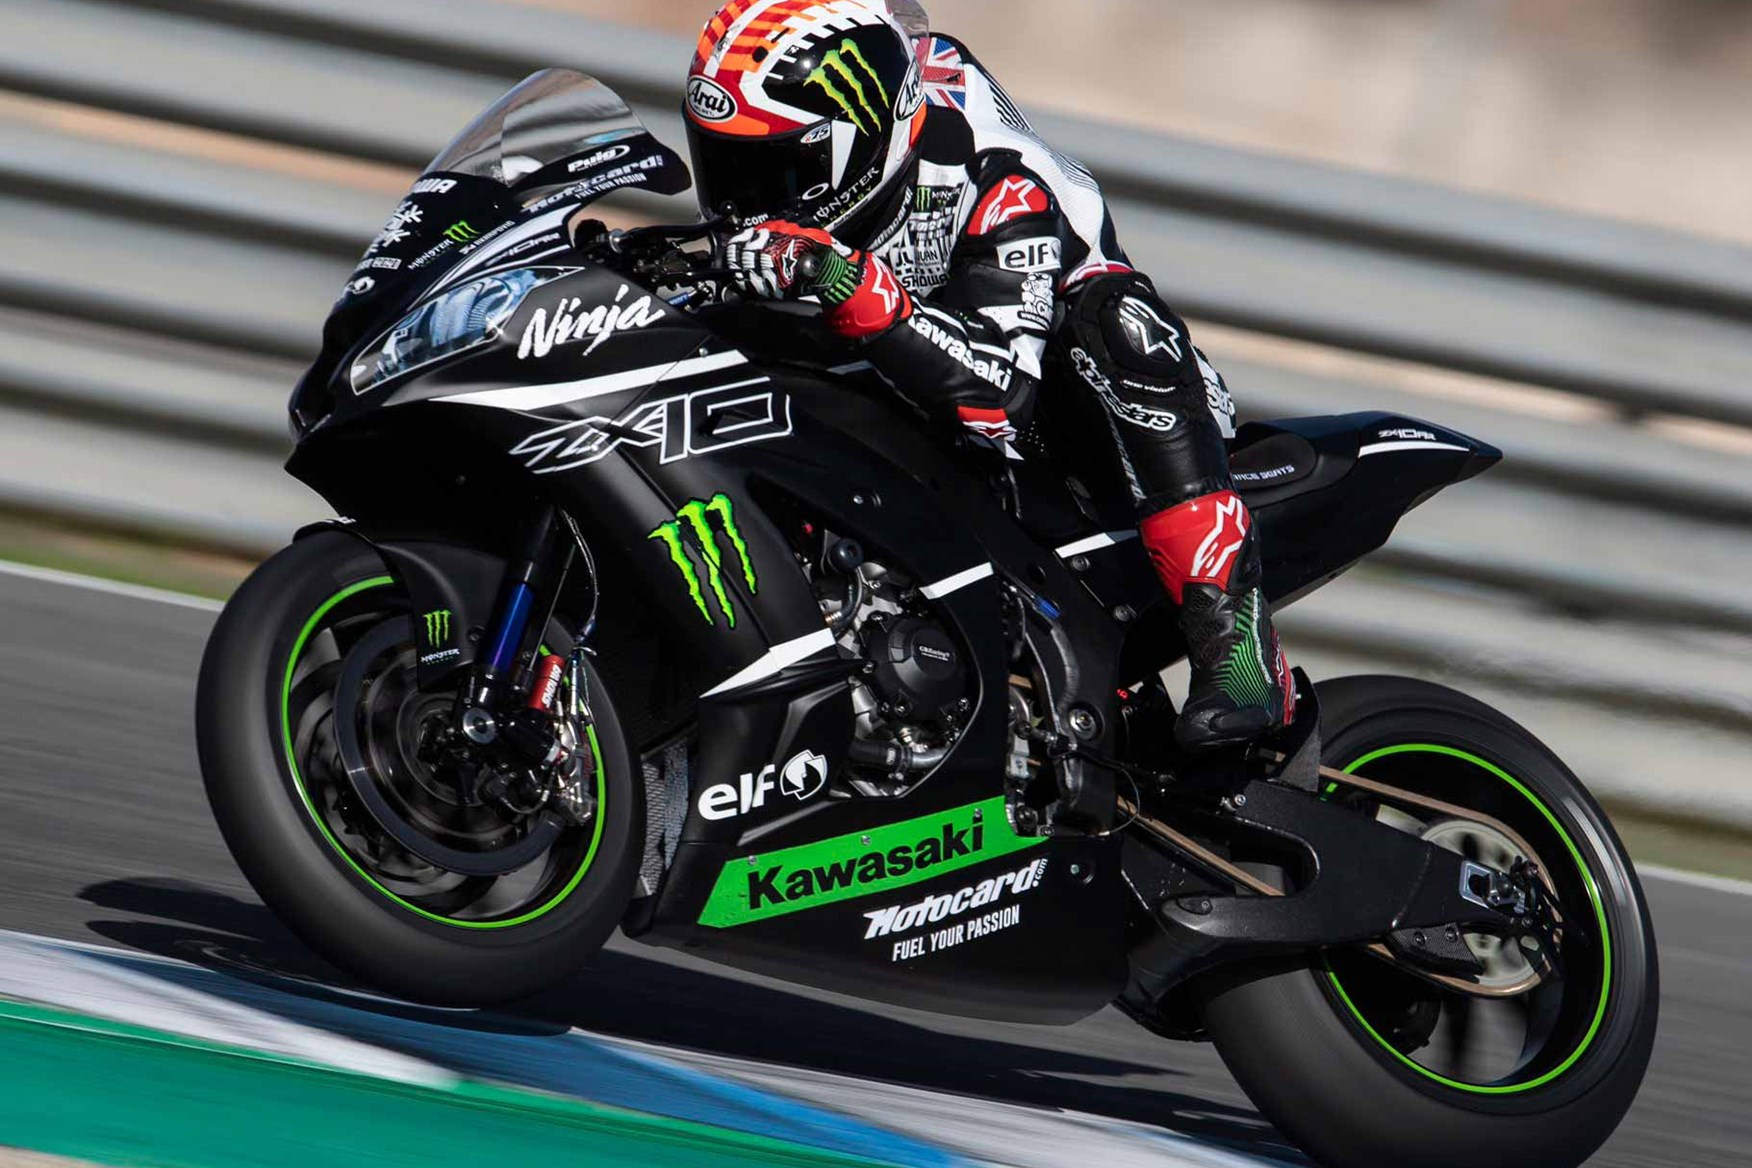 WSB: Pre-season testing resumes with two-day visit to Jerez